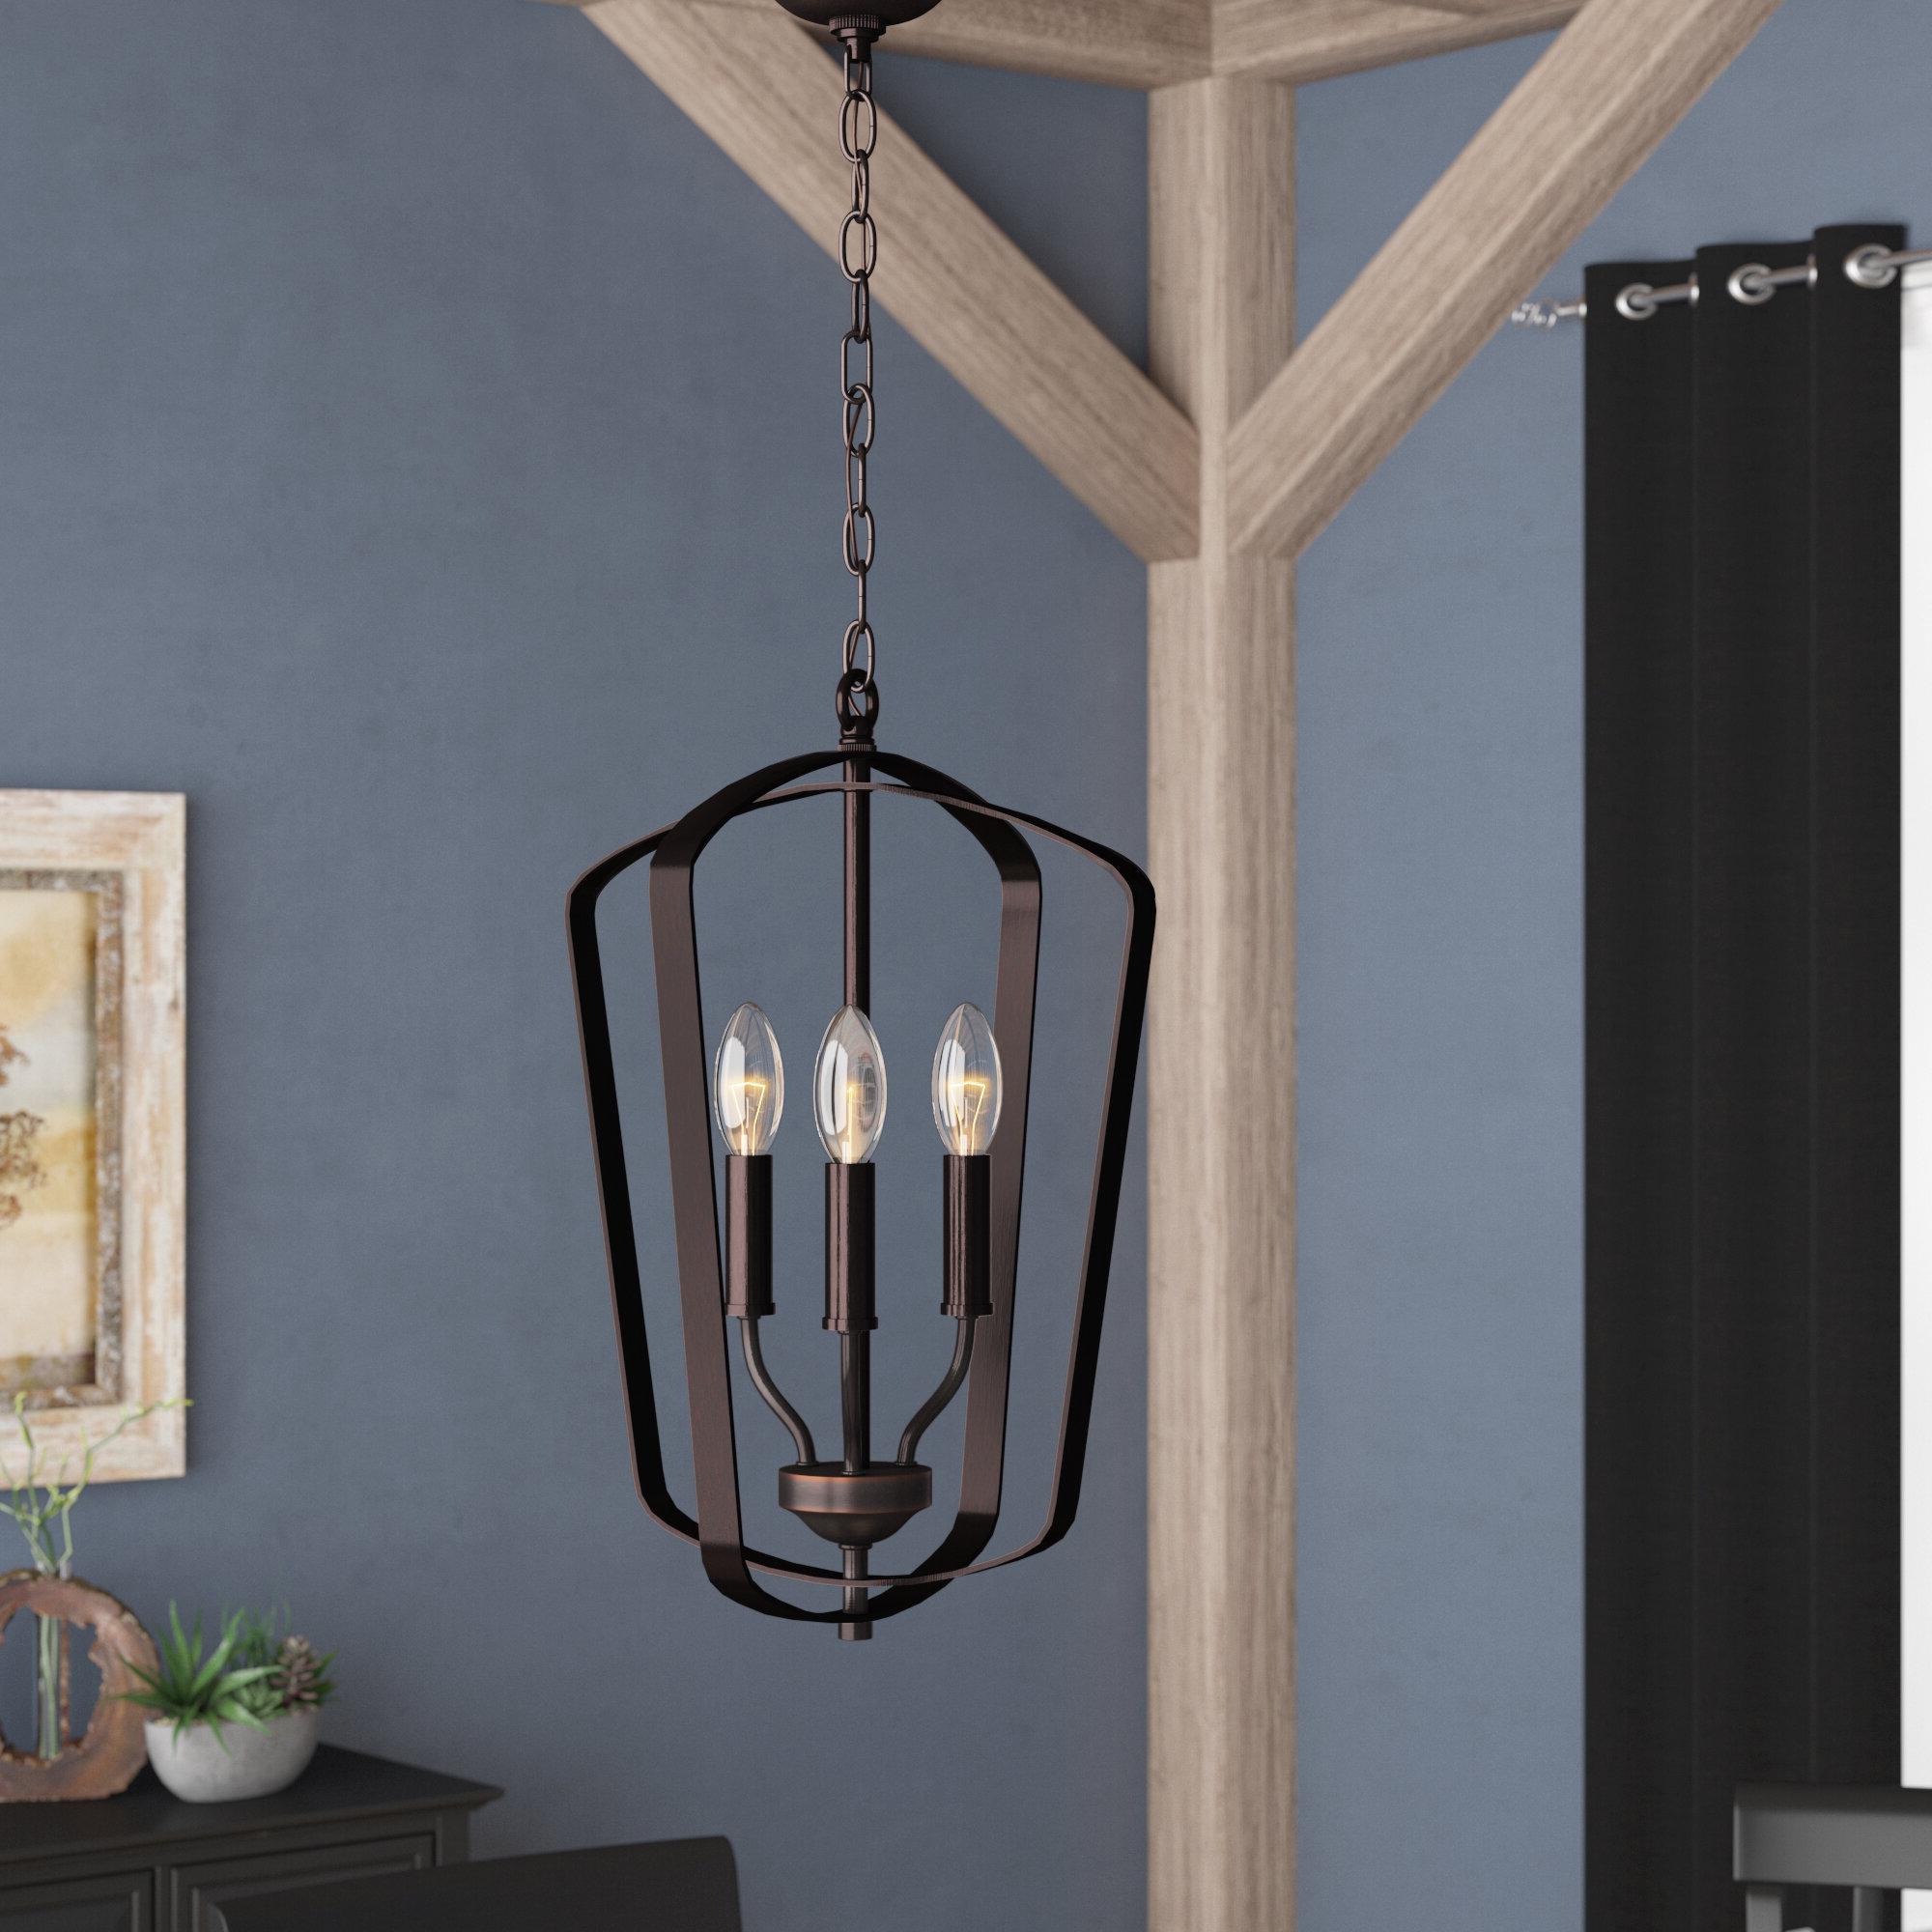 Chauvin 3 Light Lantern Geometric Pendants Regarding Famous Firman 3 Light Single Geometric Pendant (View 10 of 20)